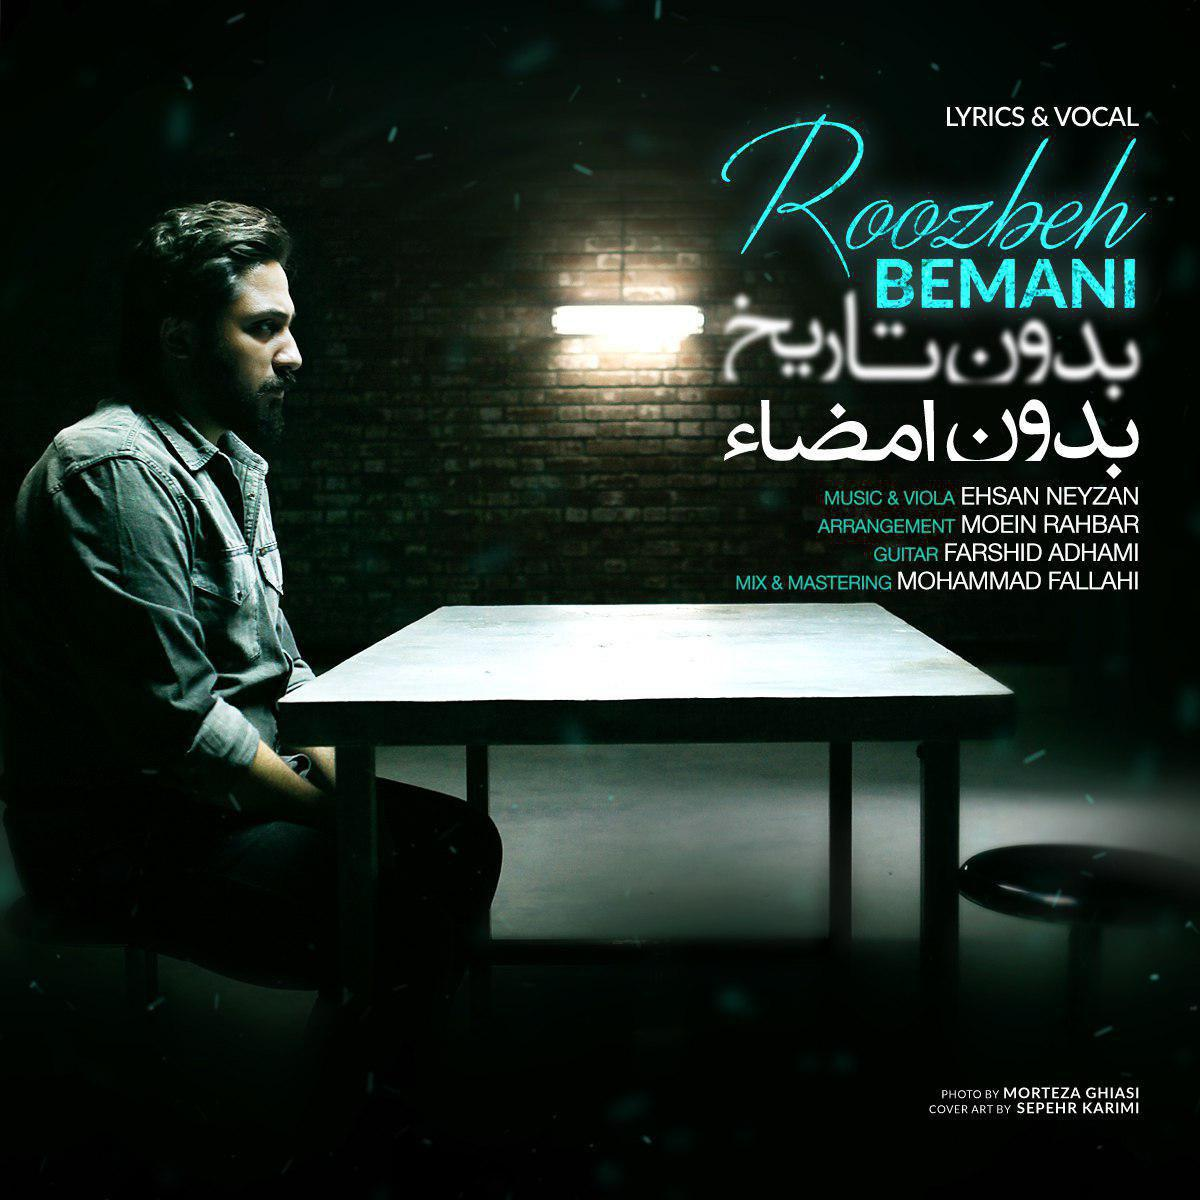 Roozbeh Bemani – No Date No Signature